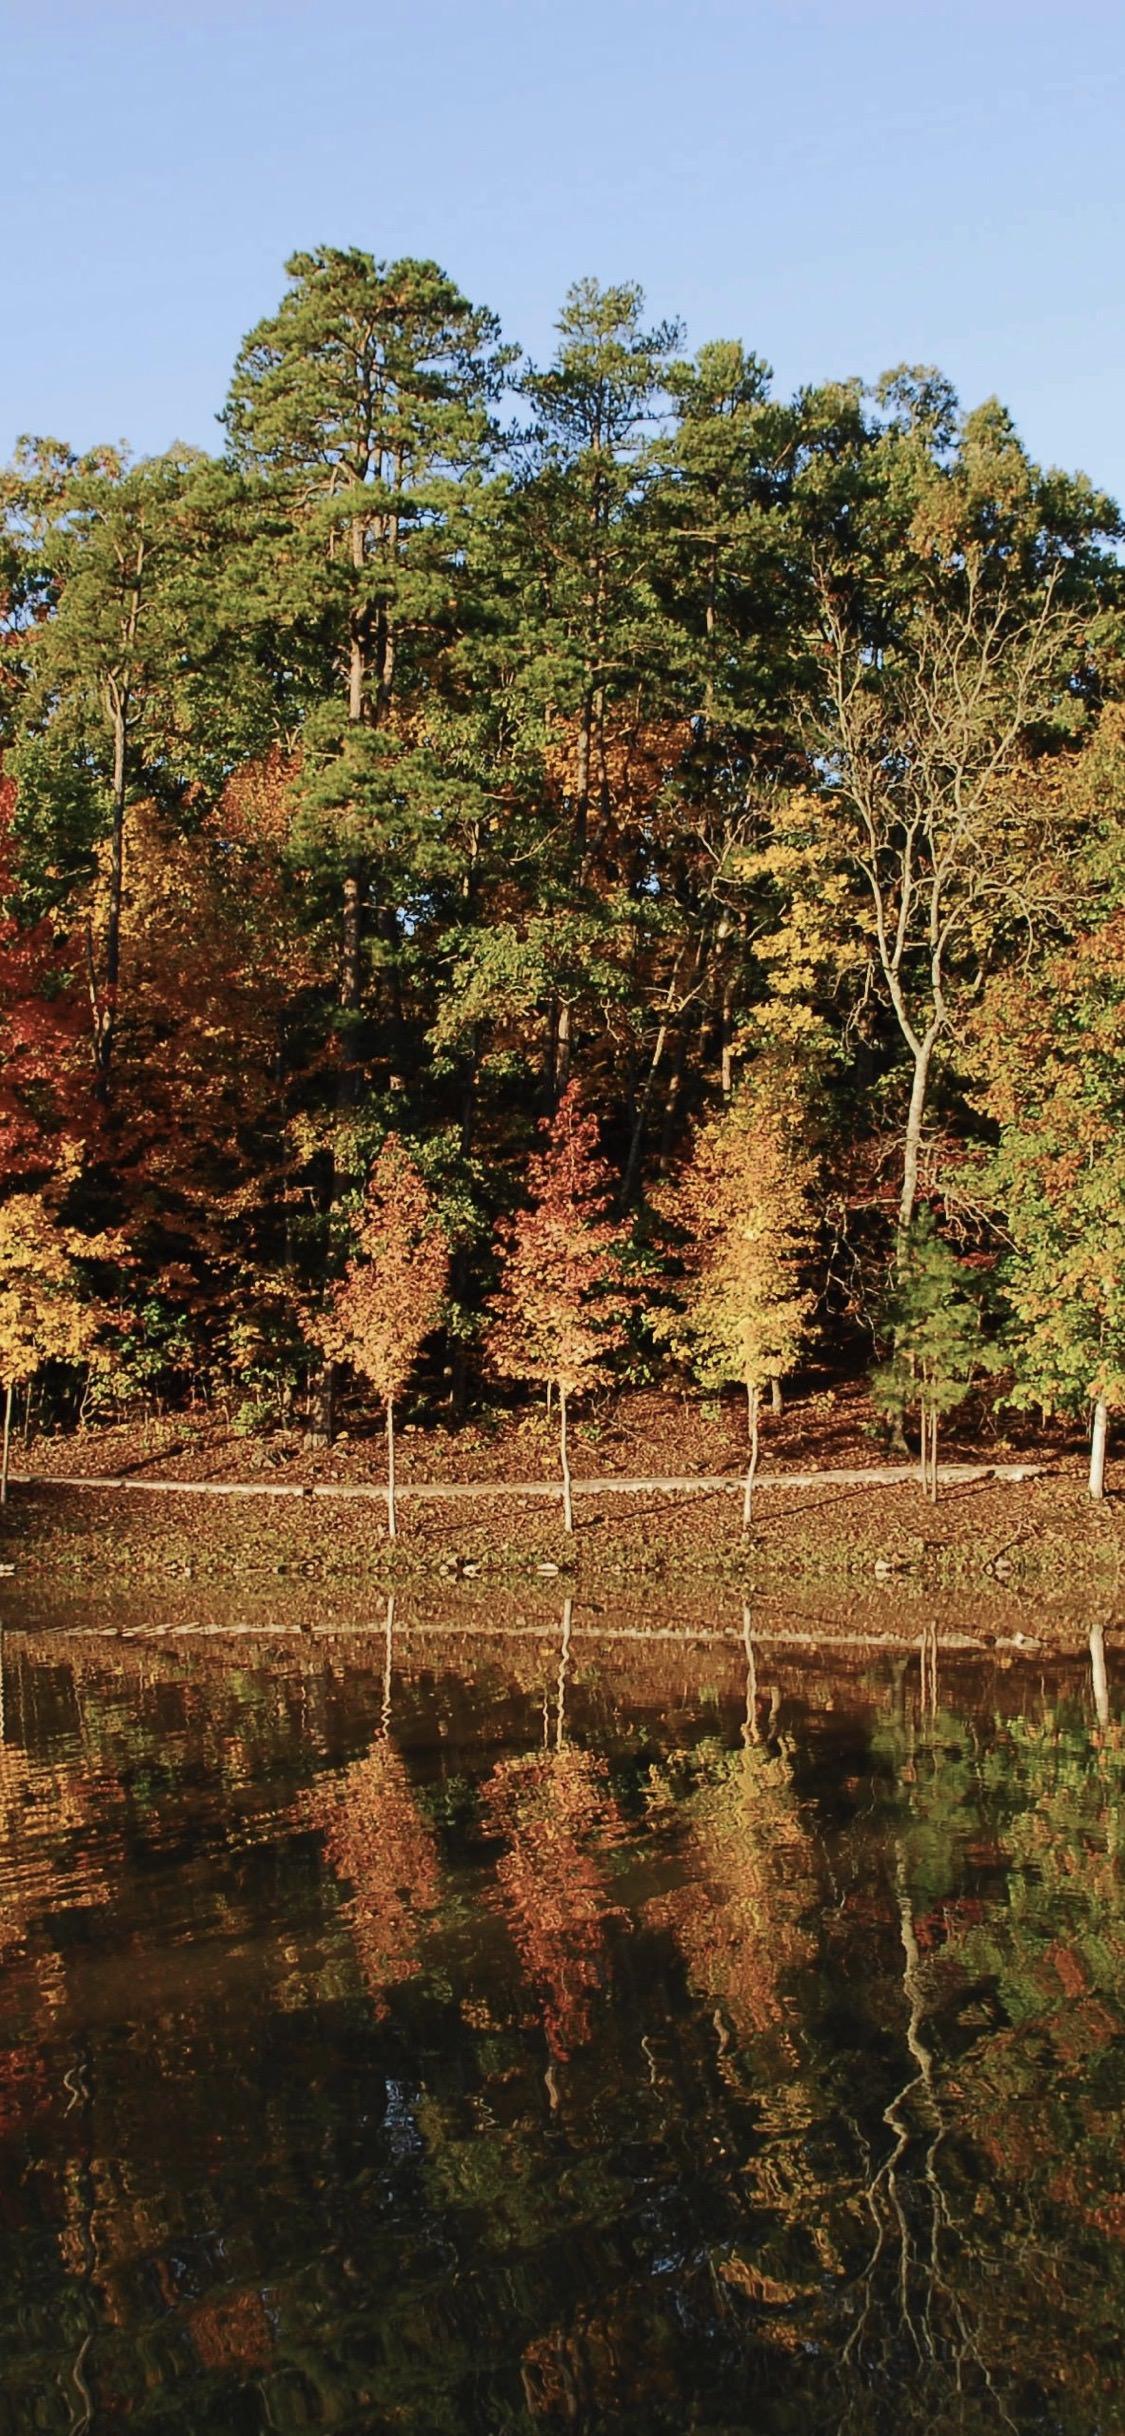 Pemandangan Gugur Daun Alam Pohon Wallpapersc IPhoneX